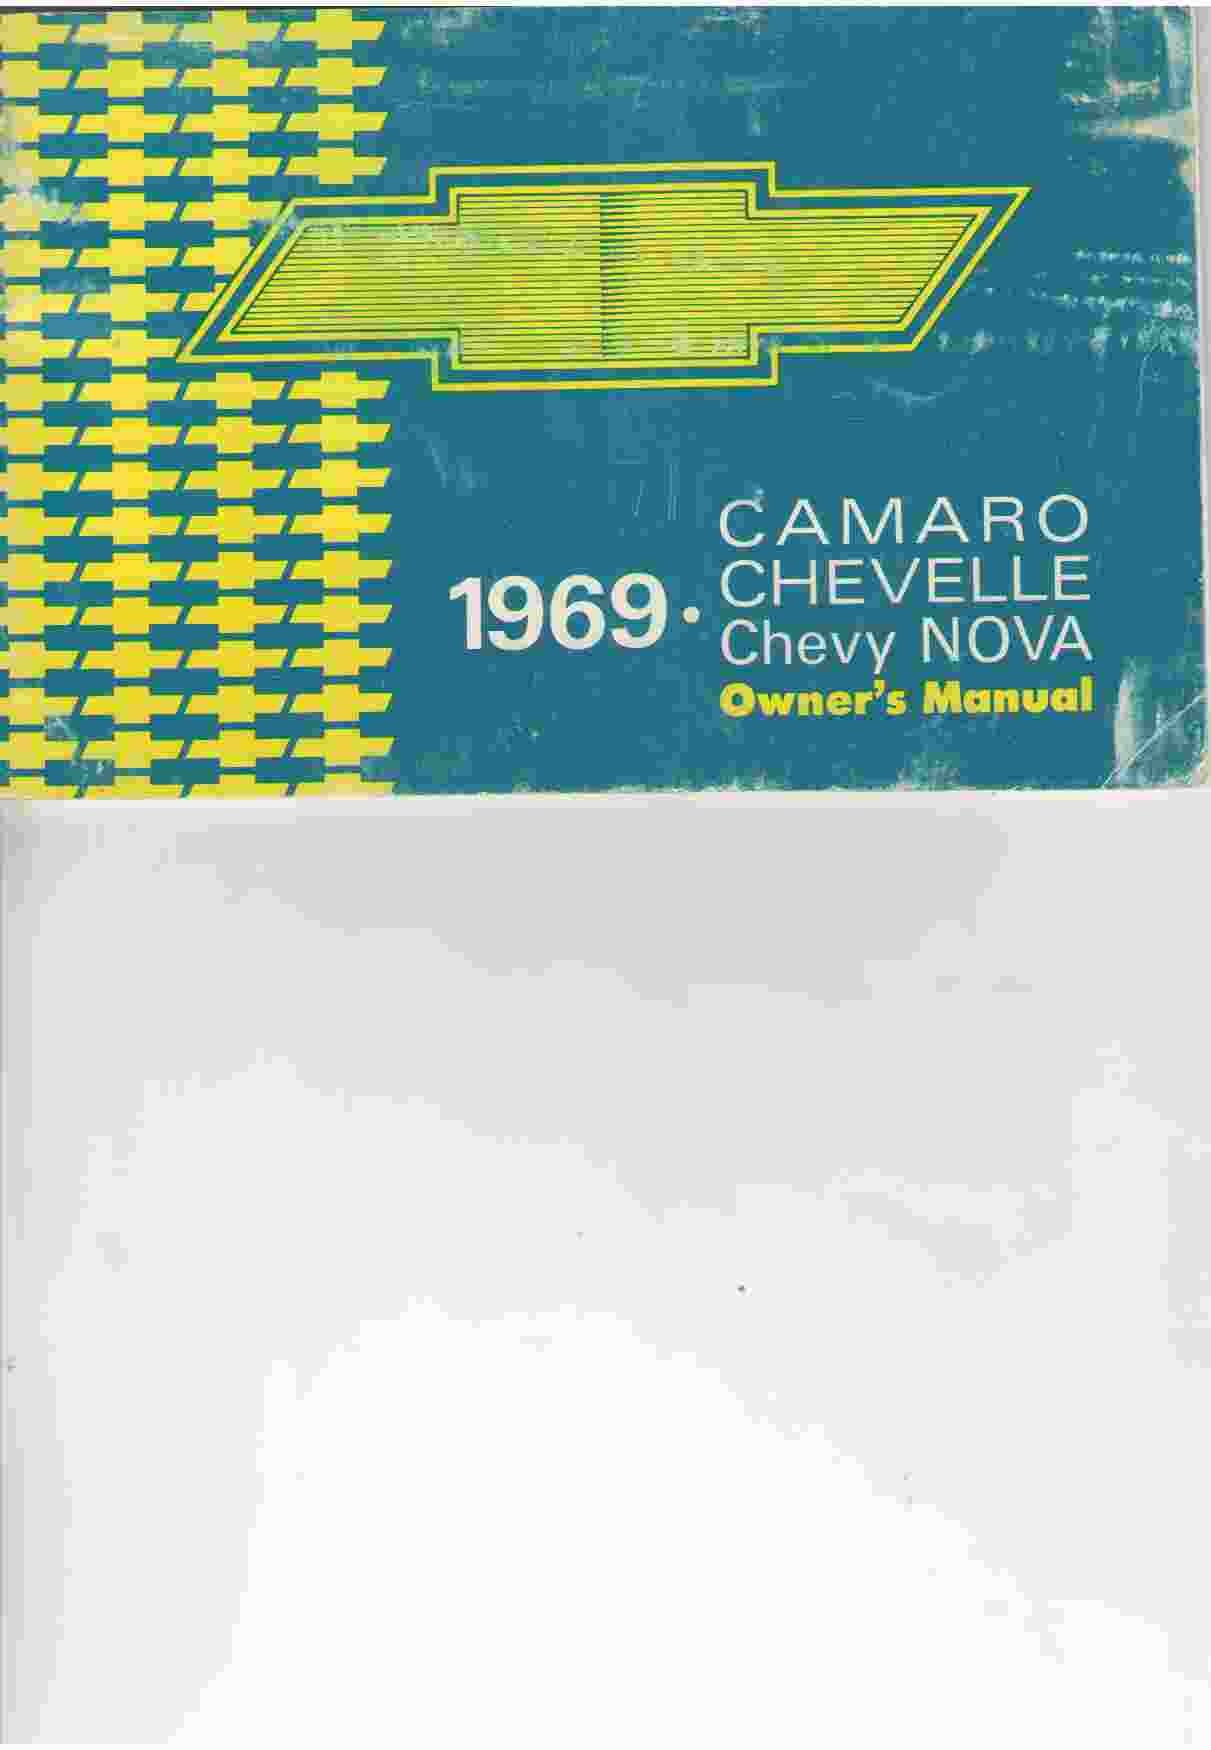 1969 CAMARO CHEVELLE CHEVY NOVA OWNER'S MANUAL: General Motors: Amazon.com:  Books